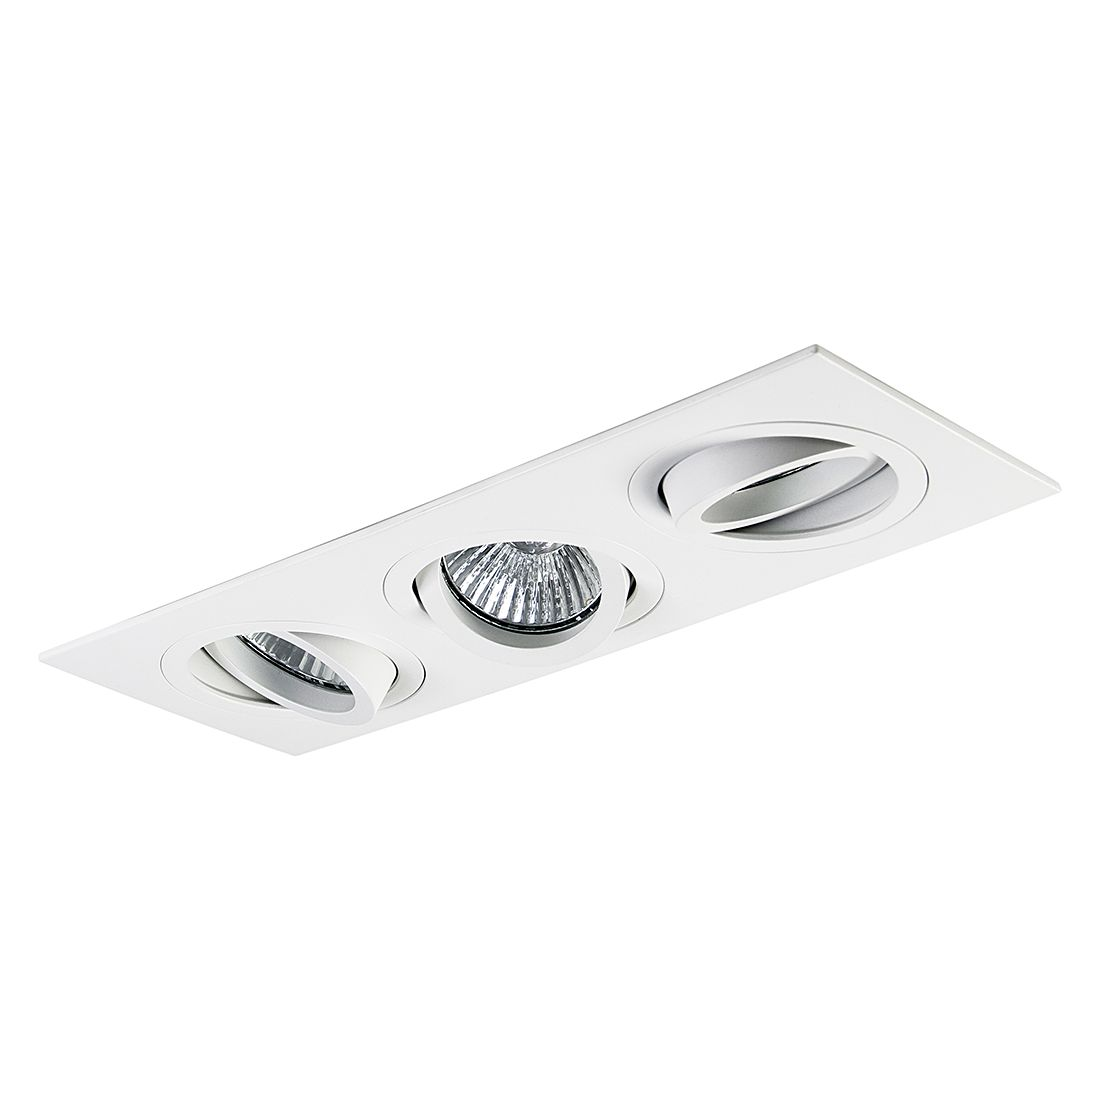 Einbauleuchte Taro Triple ● Aluminium ● 3-flammig- Illumina A++